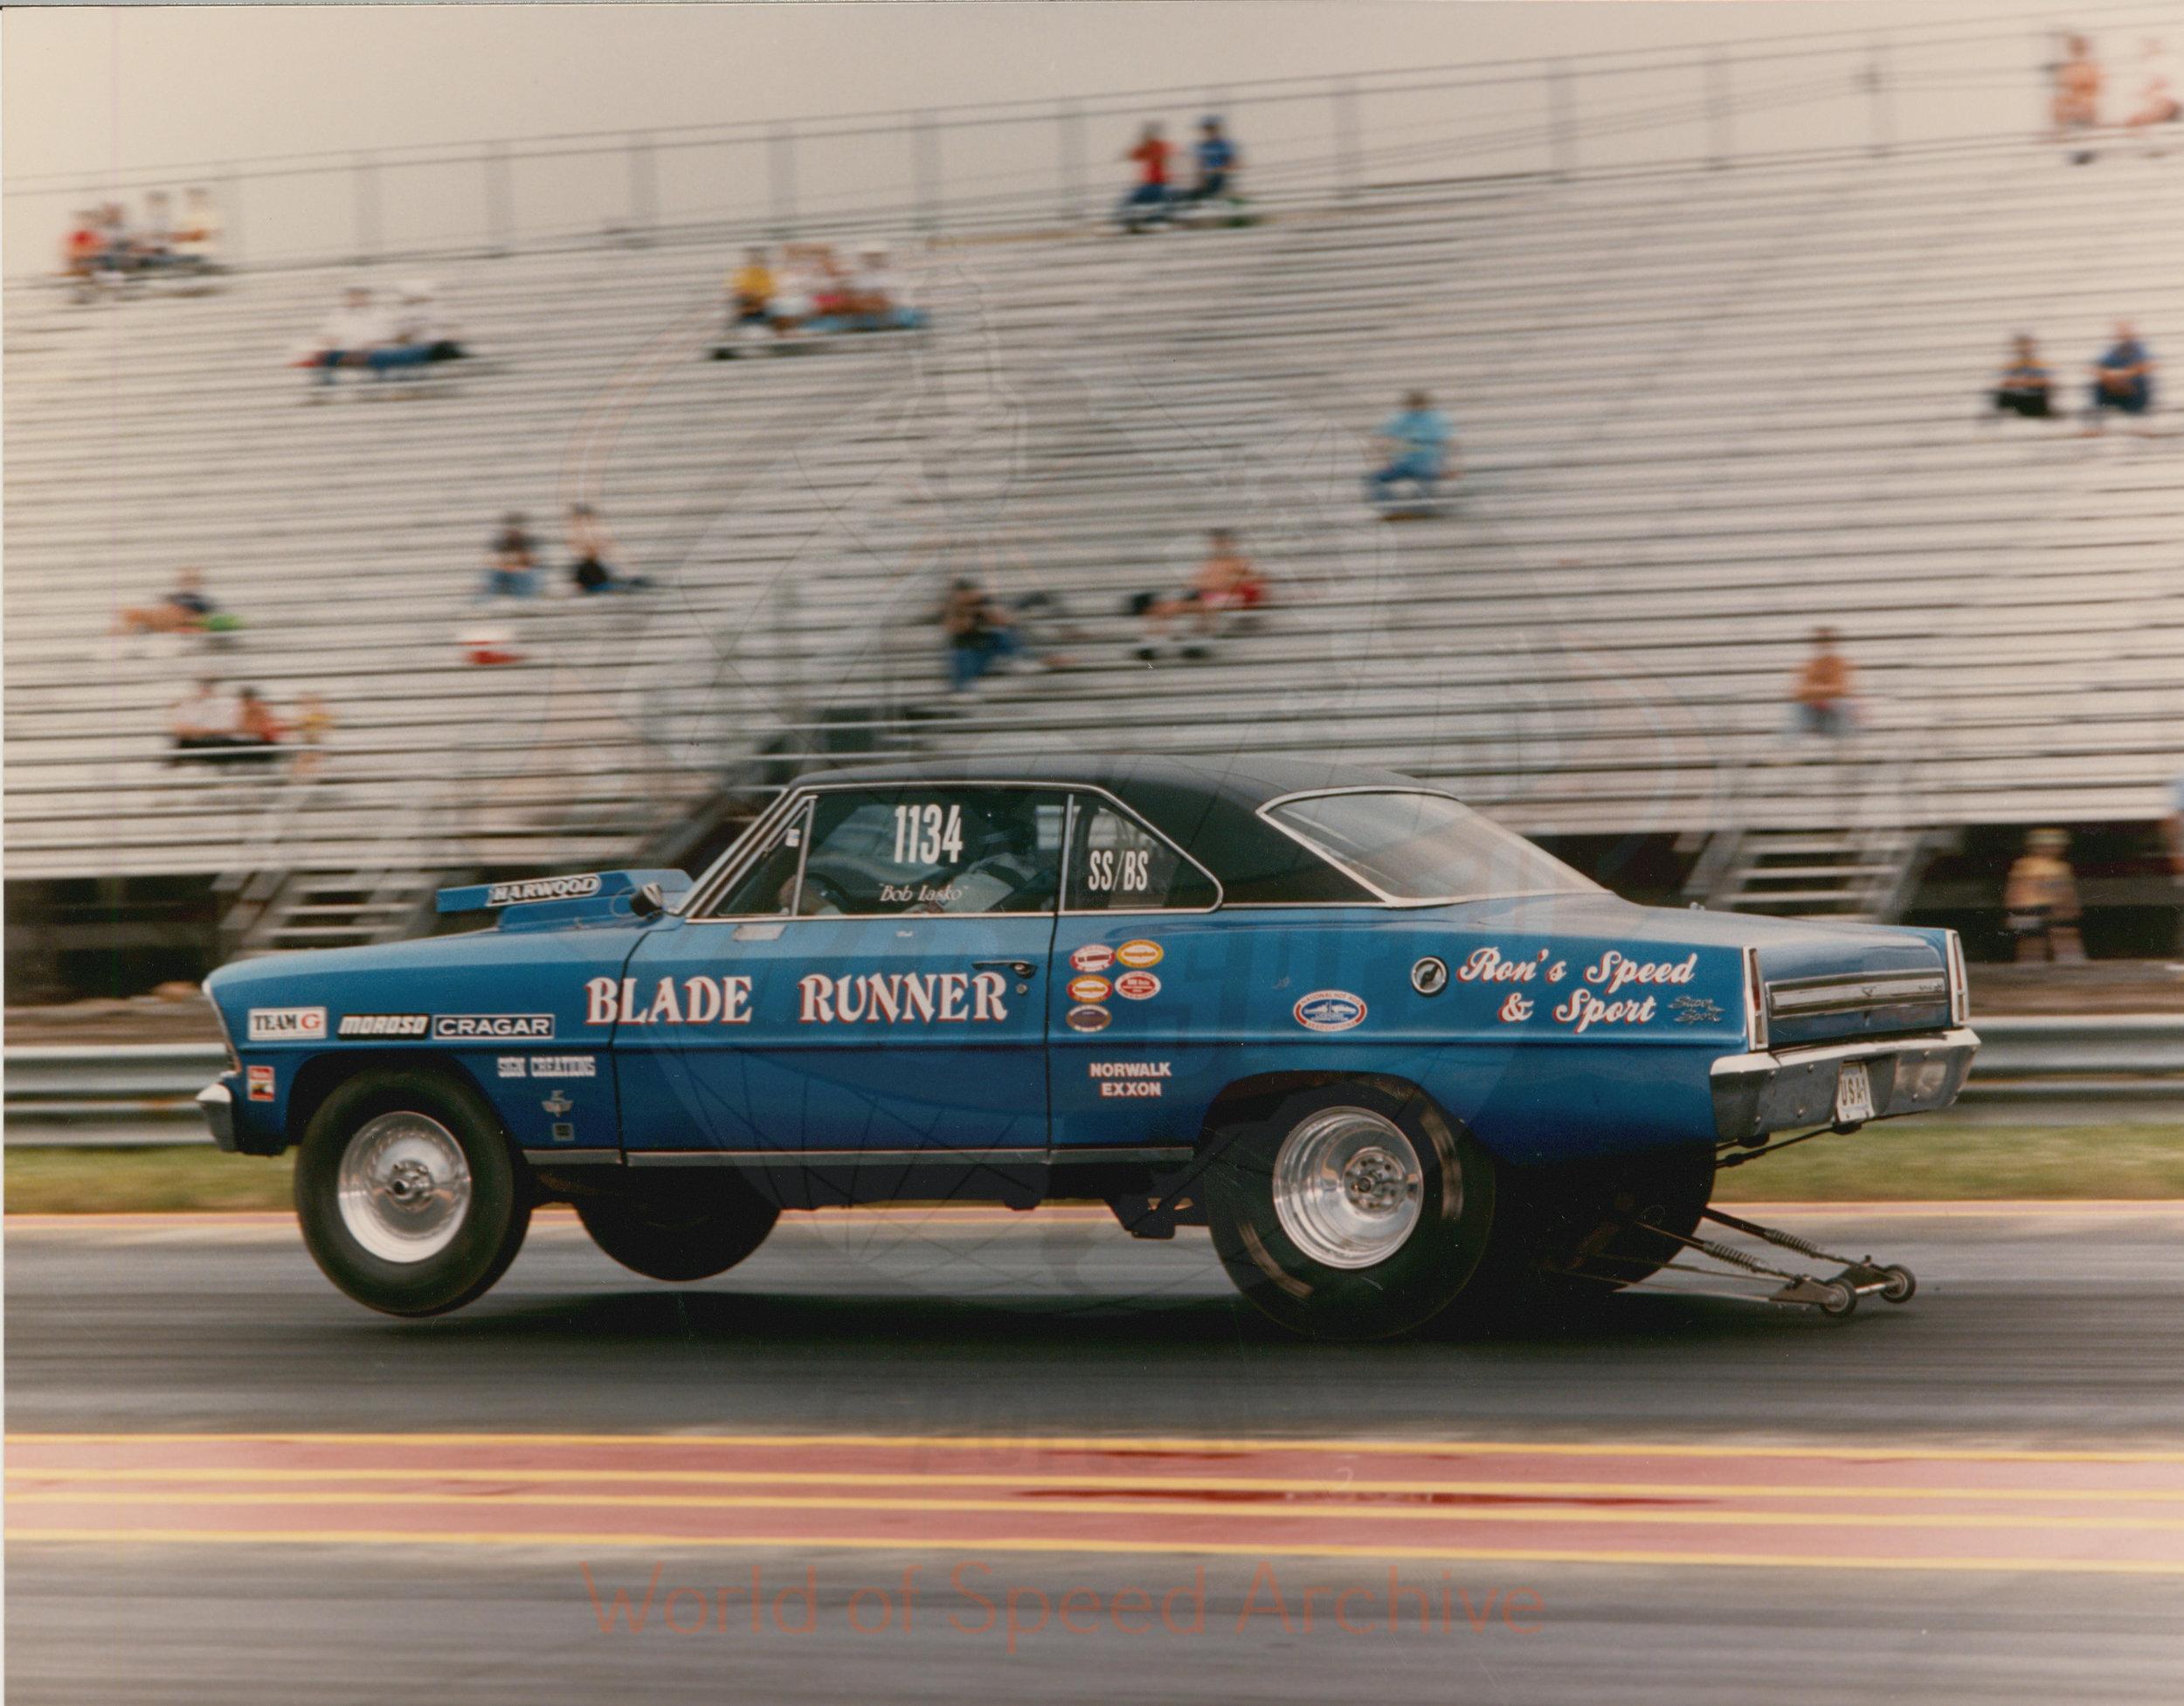 B8-S3-G1-F35-004 - Blade Runner, Ron's Speed & Sport